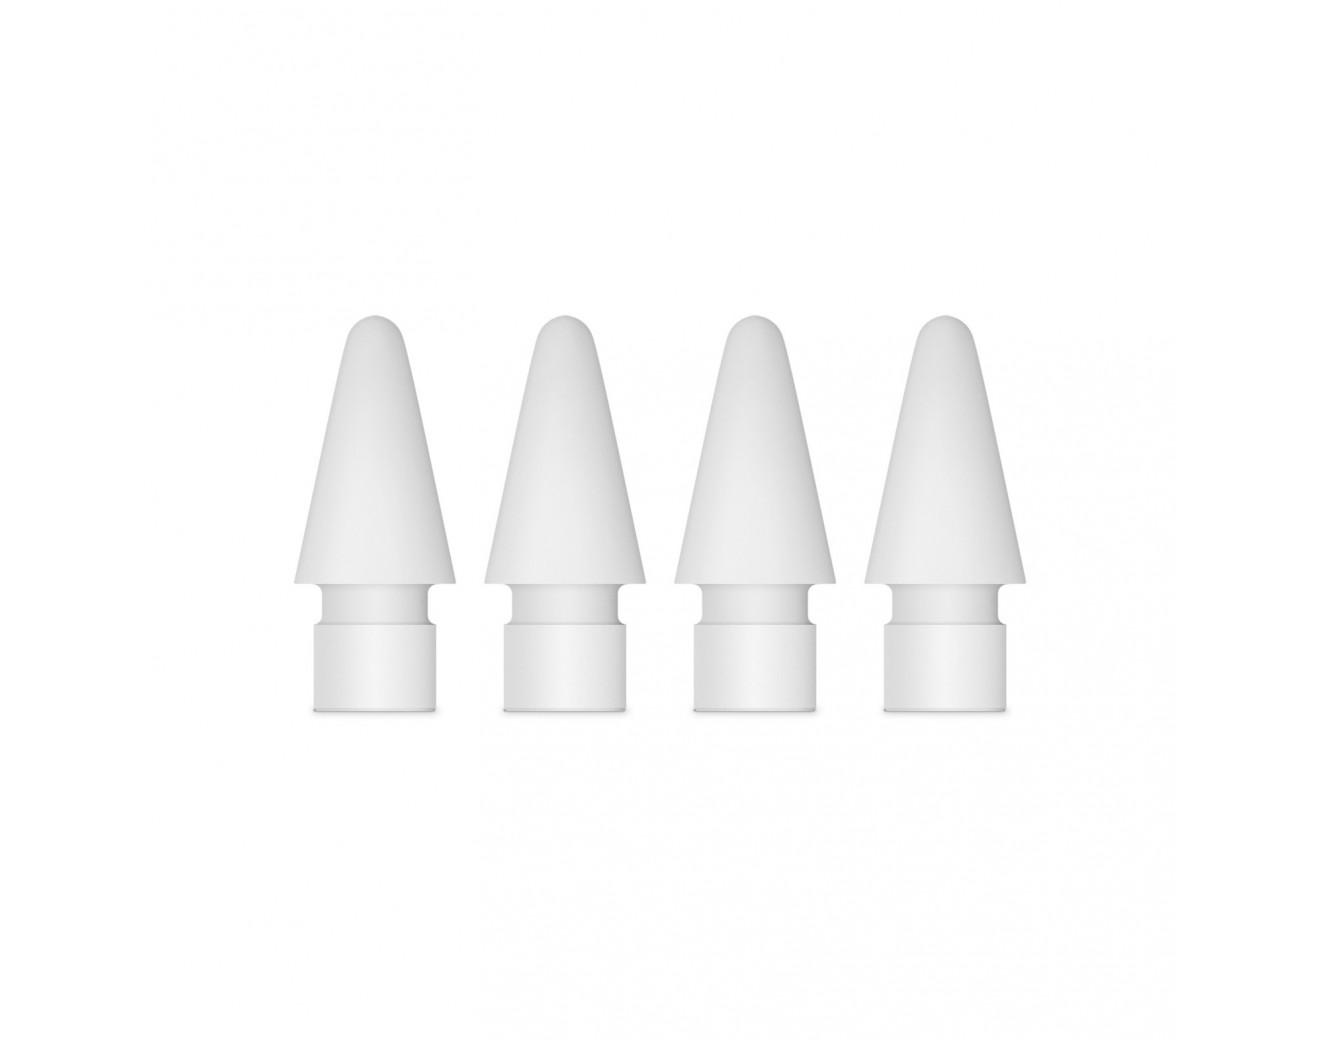 Стилус Apple Pencil Tips - 4 pack